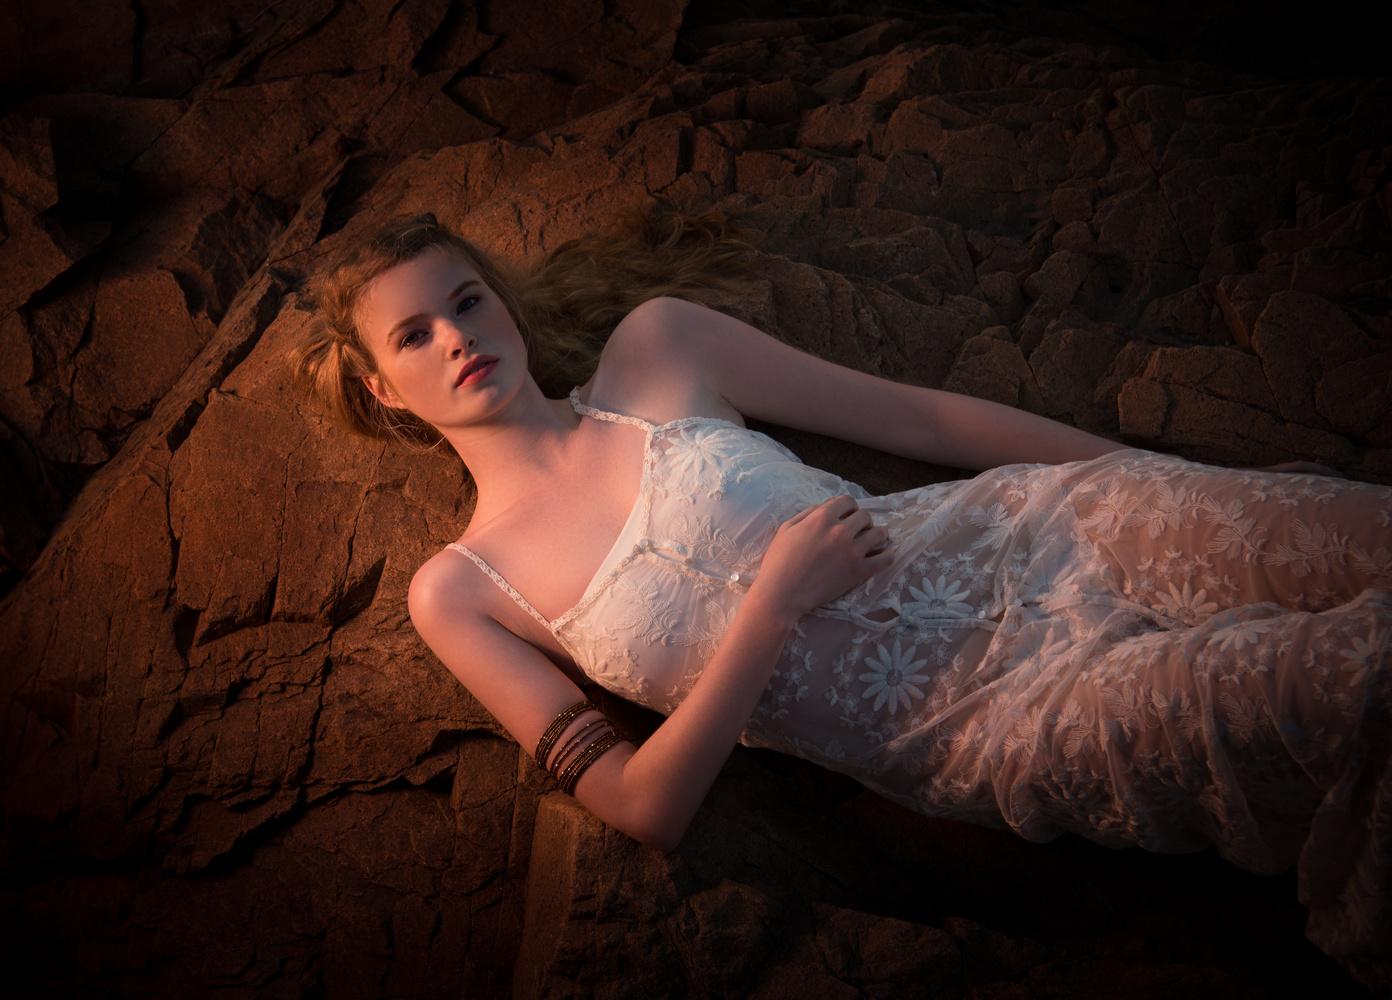 Jessica Rockport NE by Kemachat Sirichanvimol